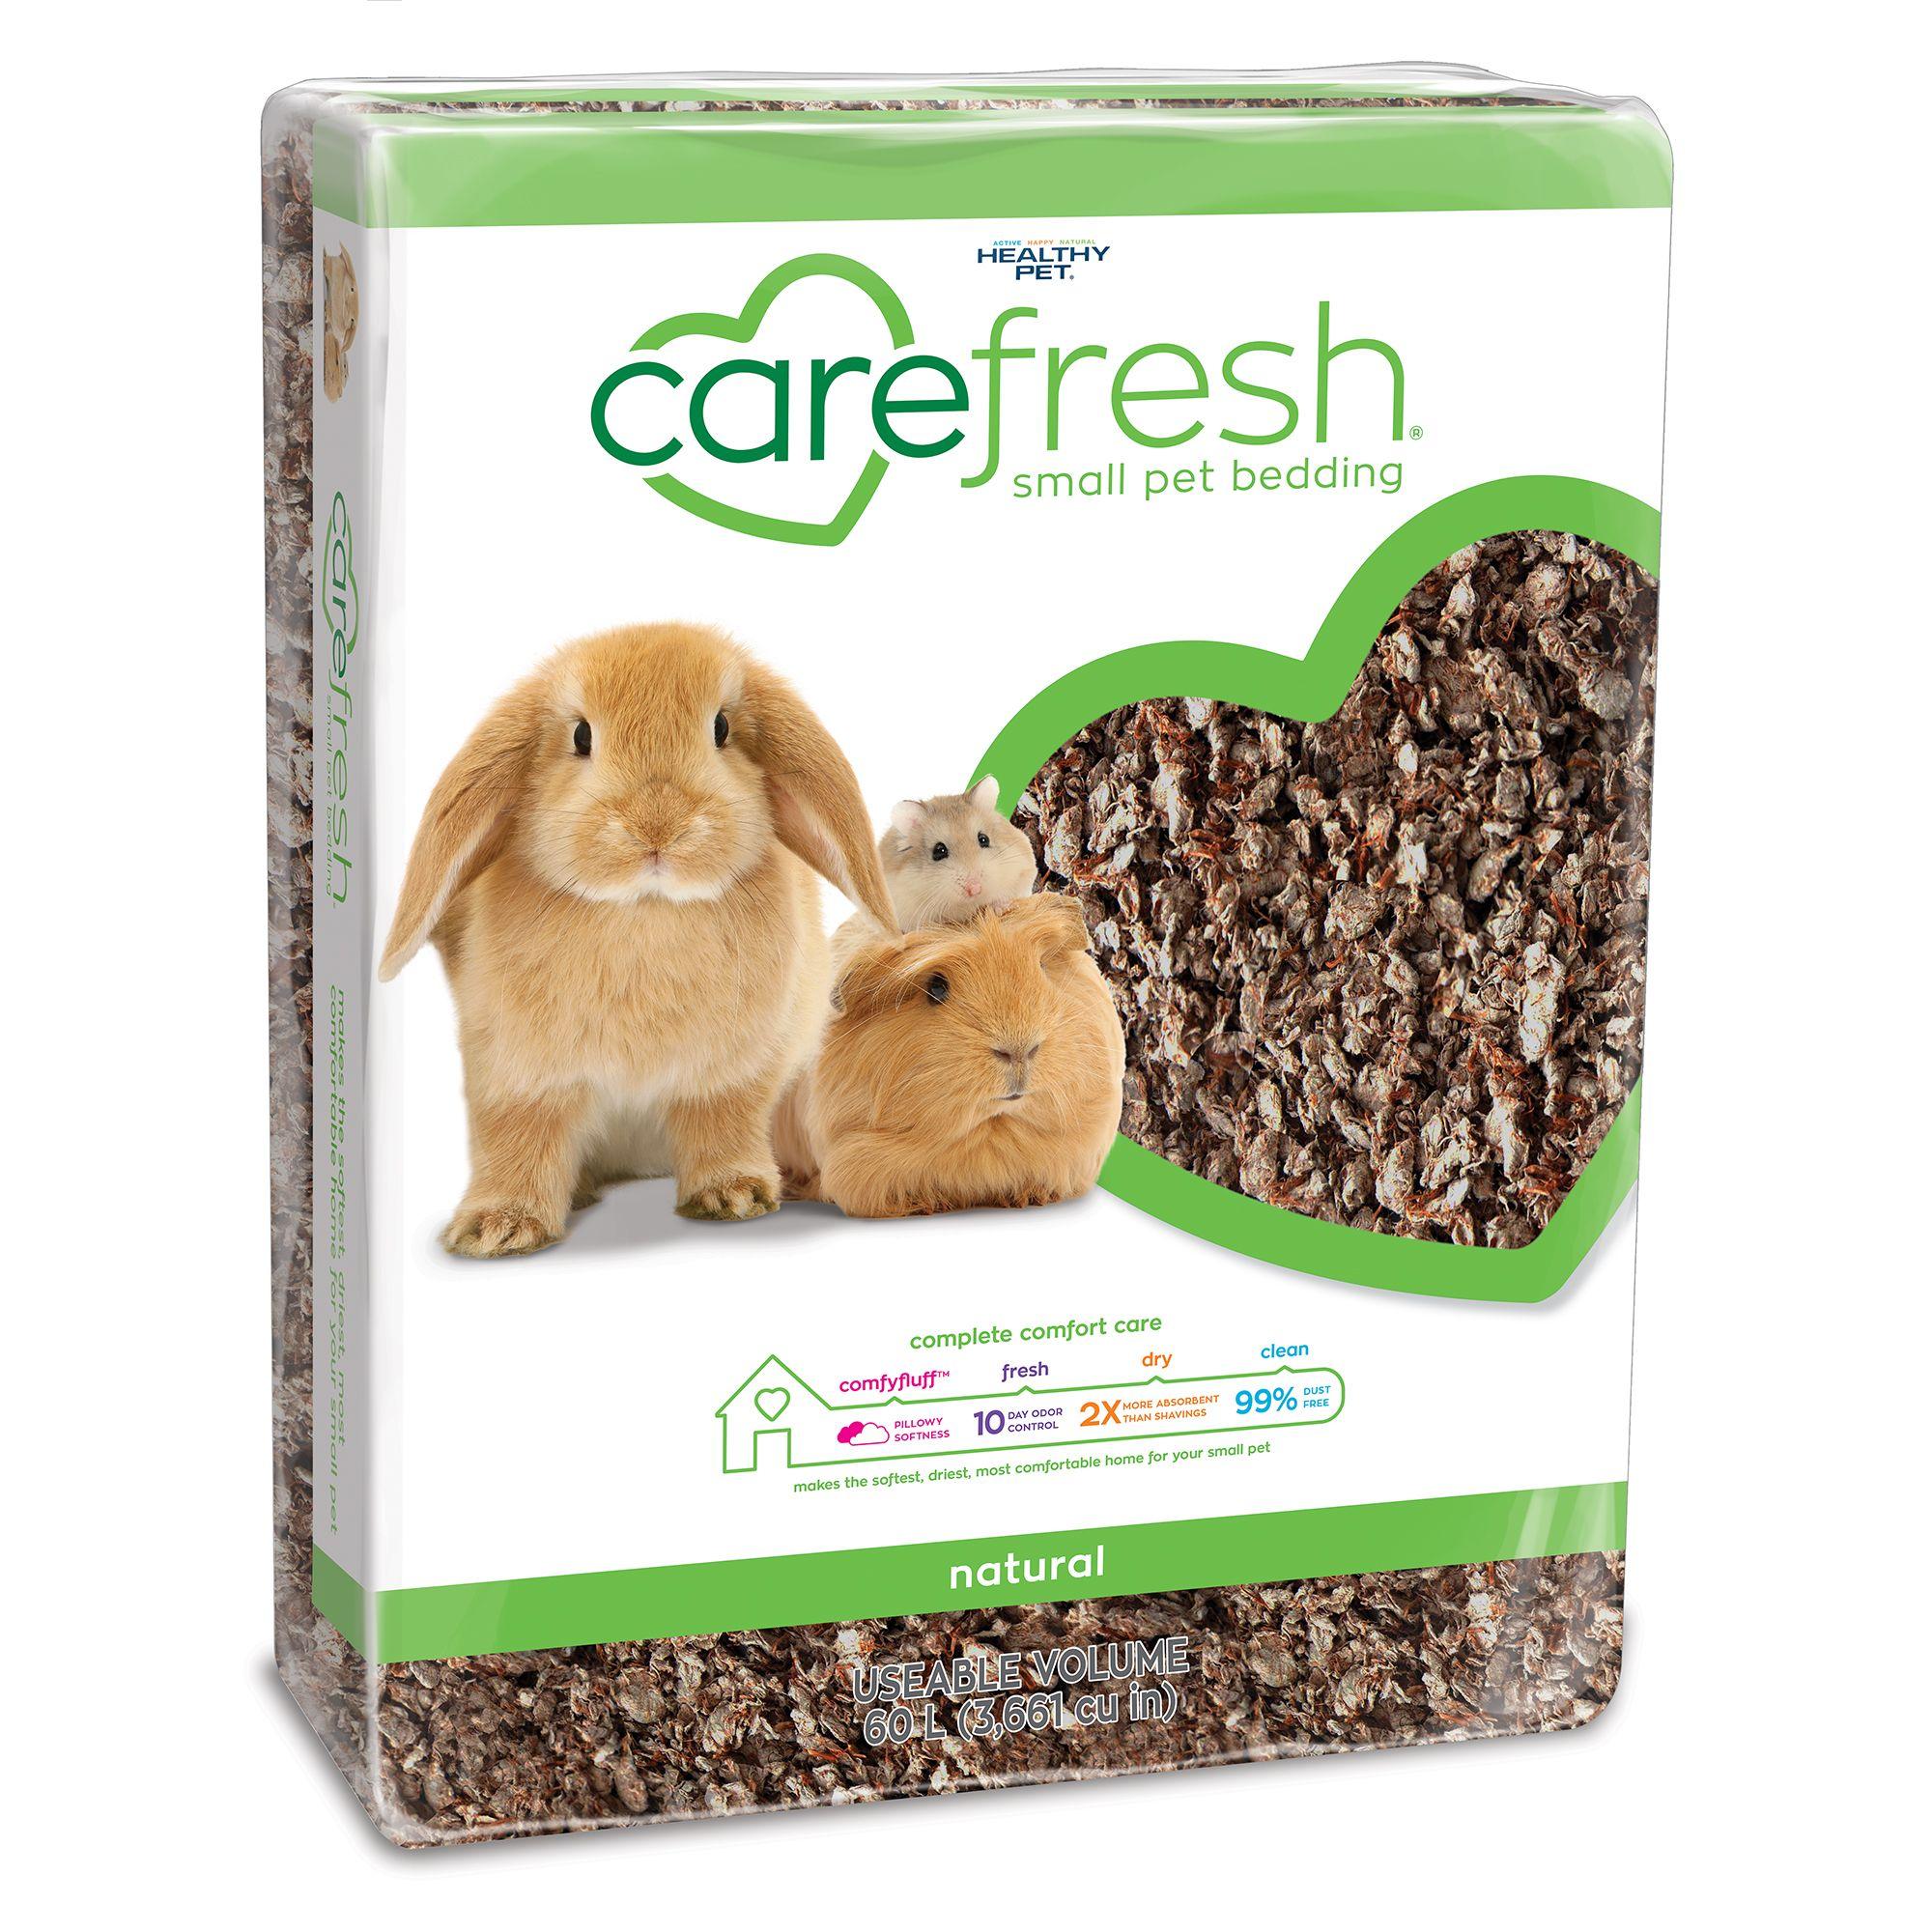 carefresh® Natural Small Pet Bedding